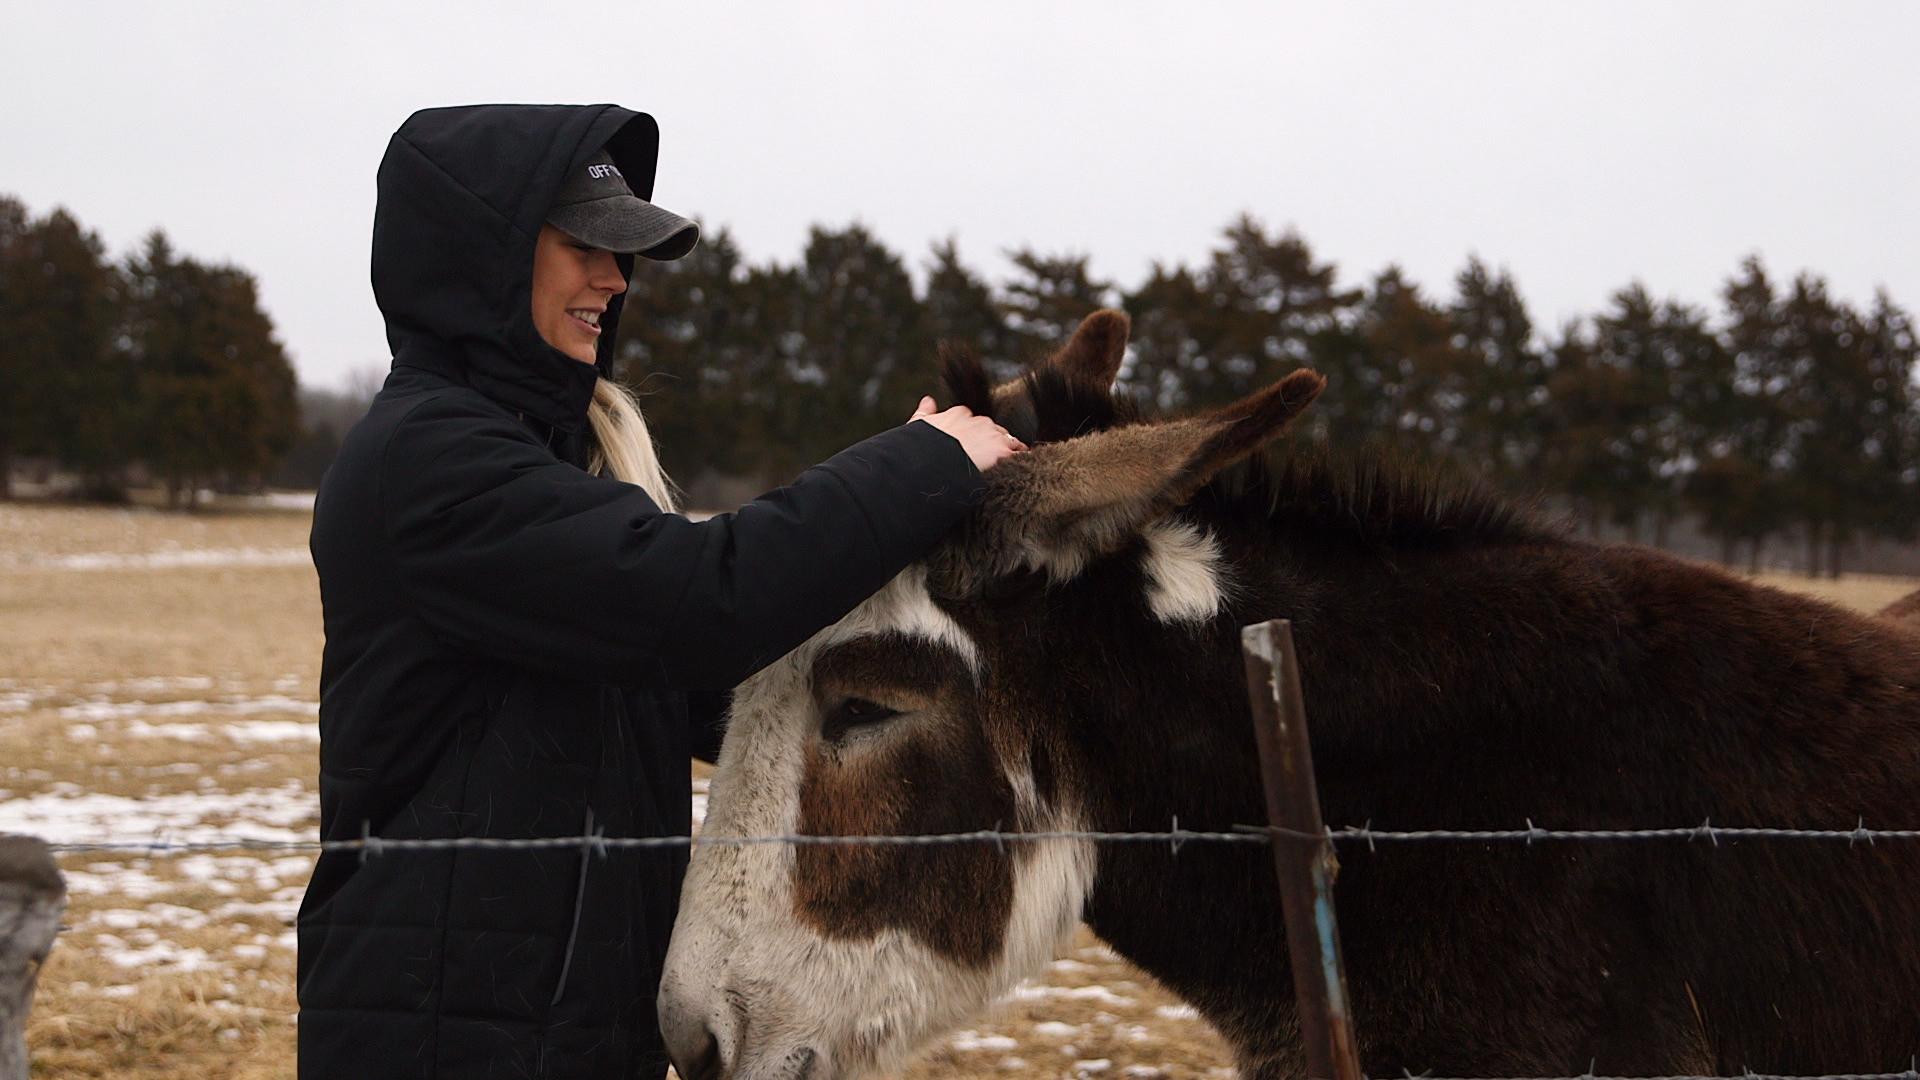 Donkey Mark 1.1.1 1 Go To Team Saint Louis Crew | ESPN   Sophie Cunningham